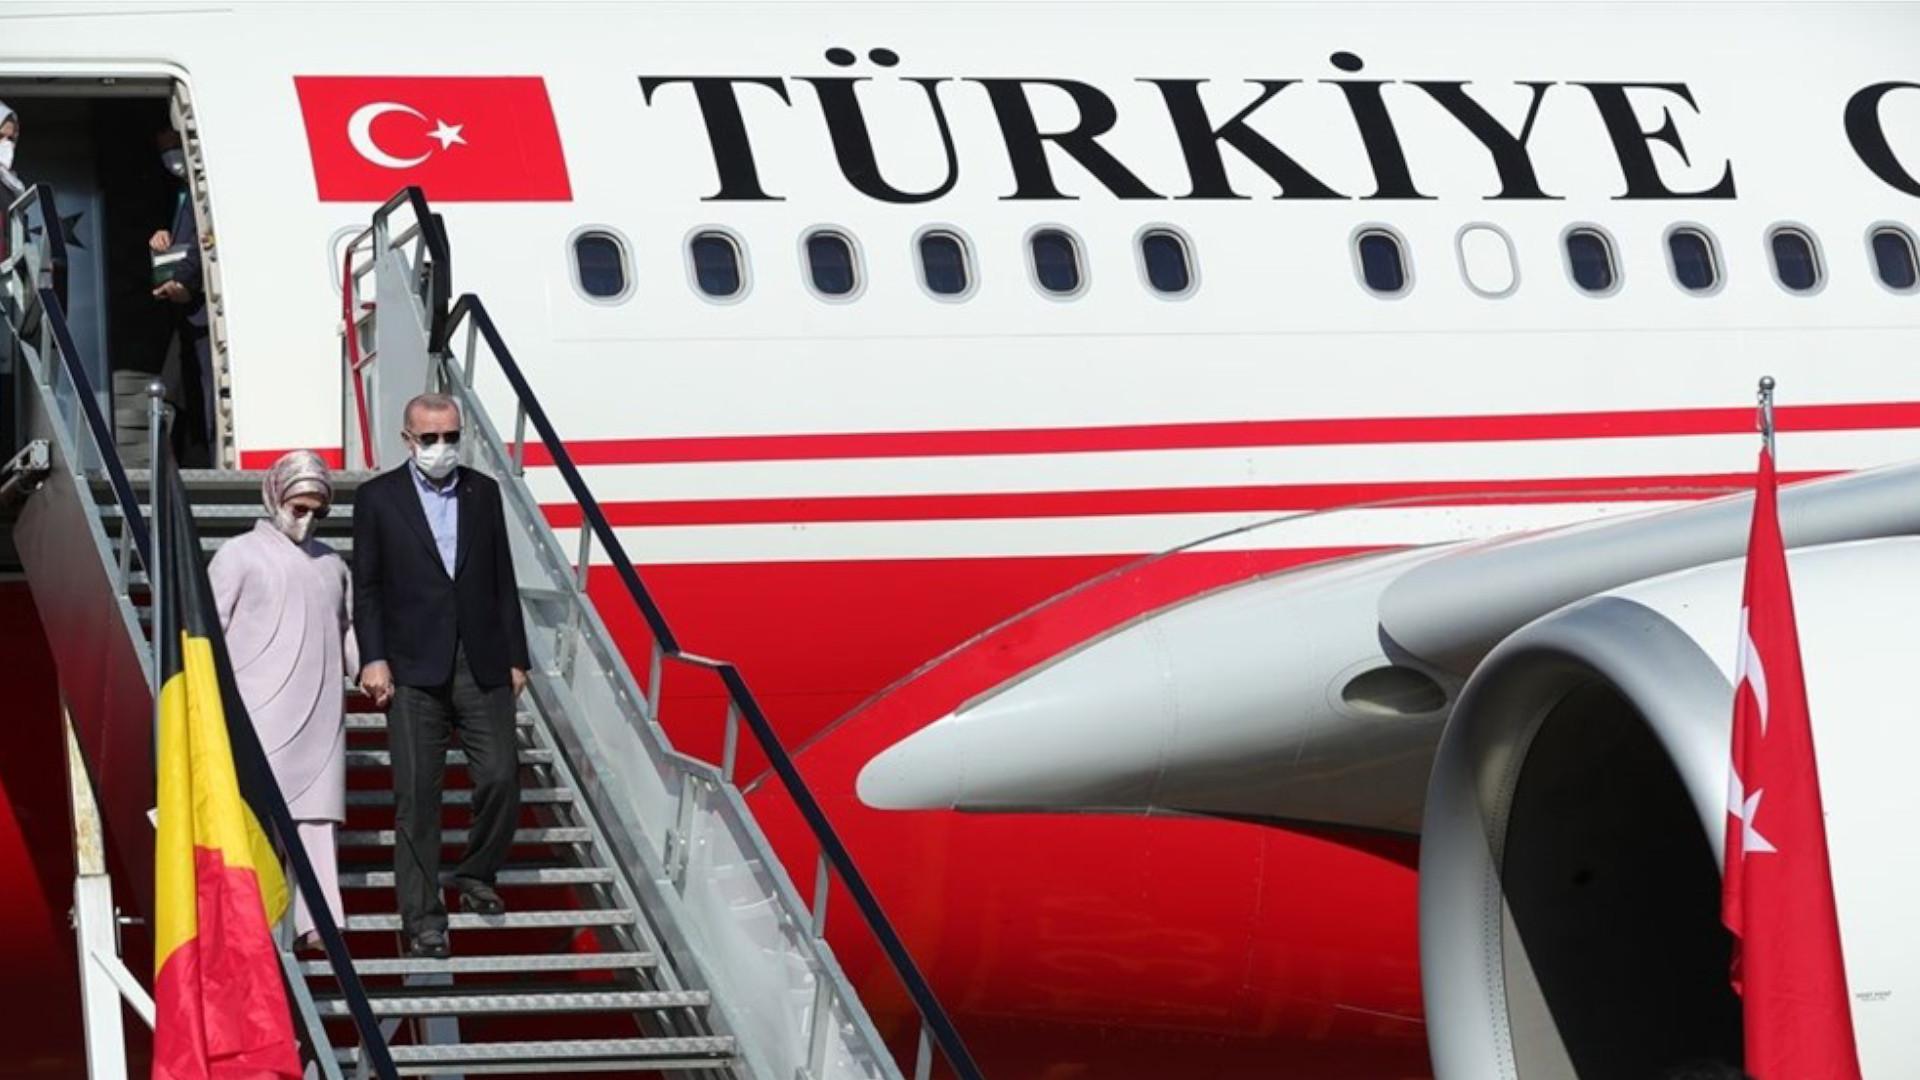 Biden-Erdoğan: S-400 and YPG in mutual parentheses?